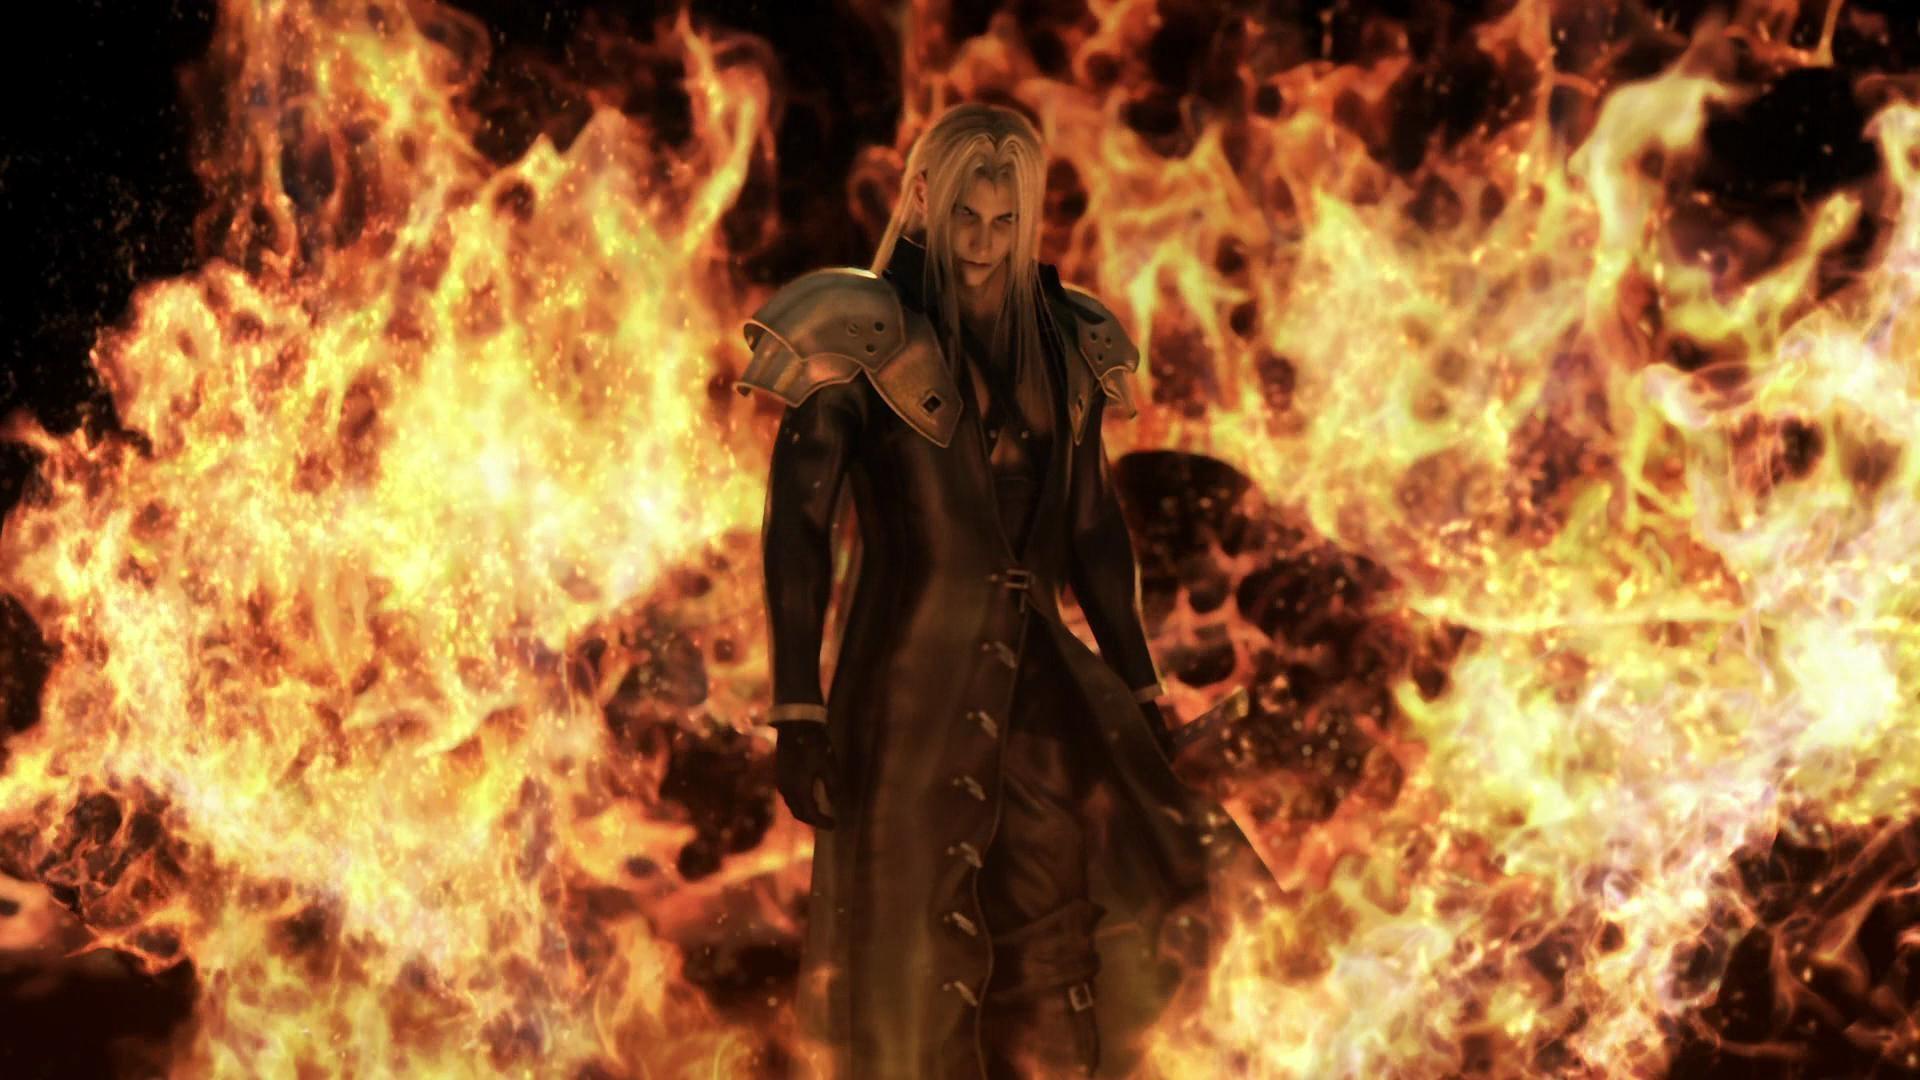 Wallpapers For > Final Fantasy Sephiroth Wallpaper